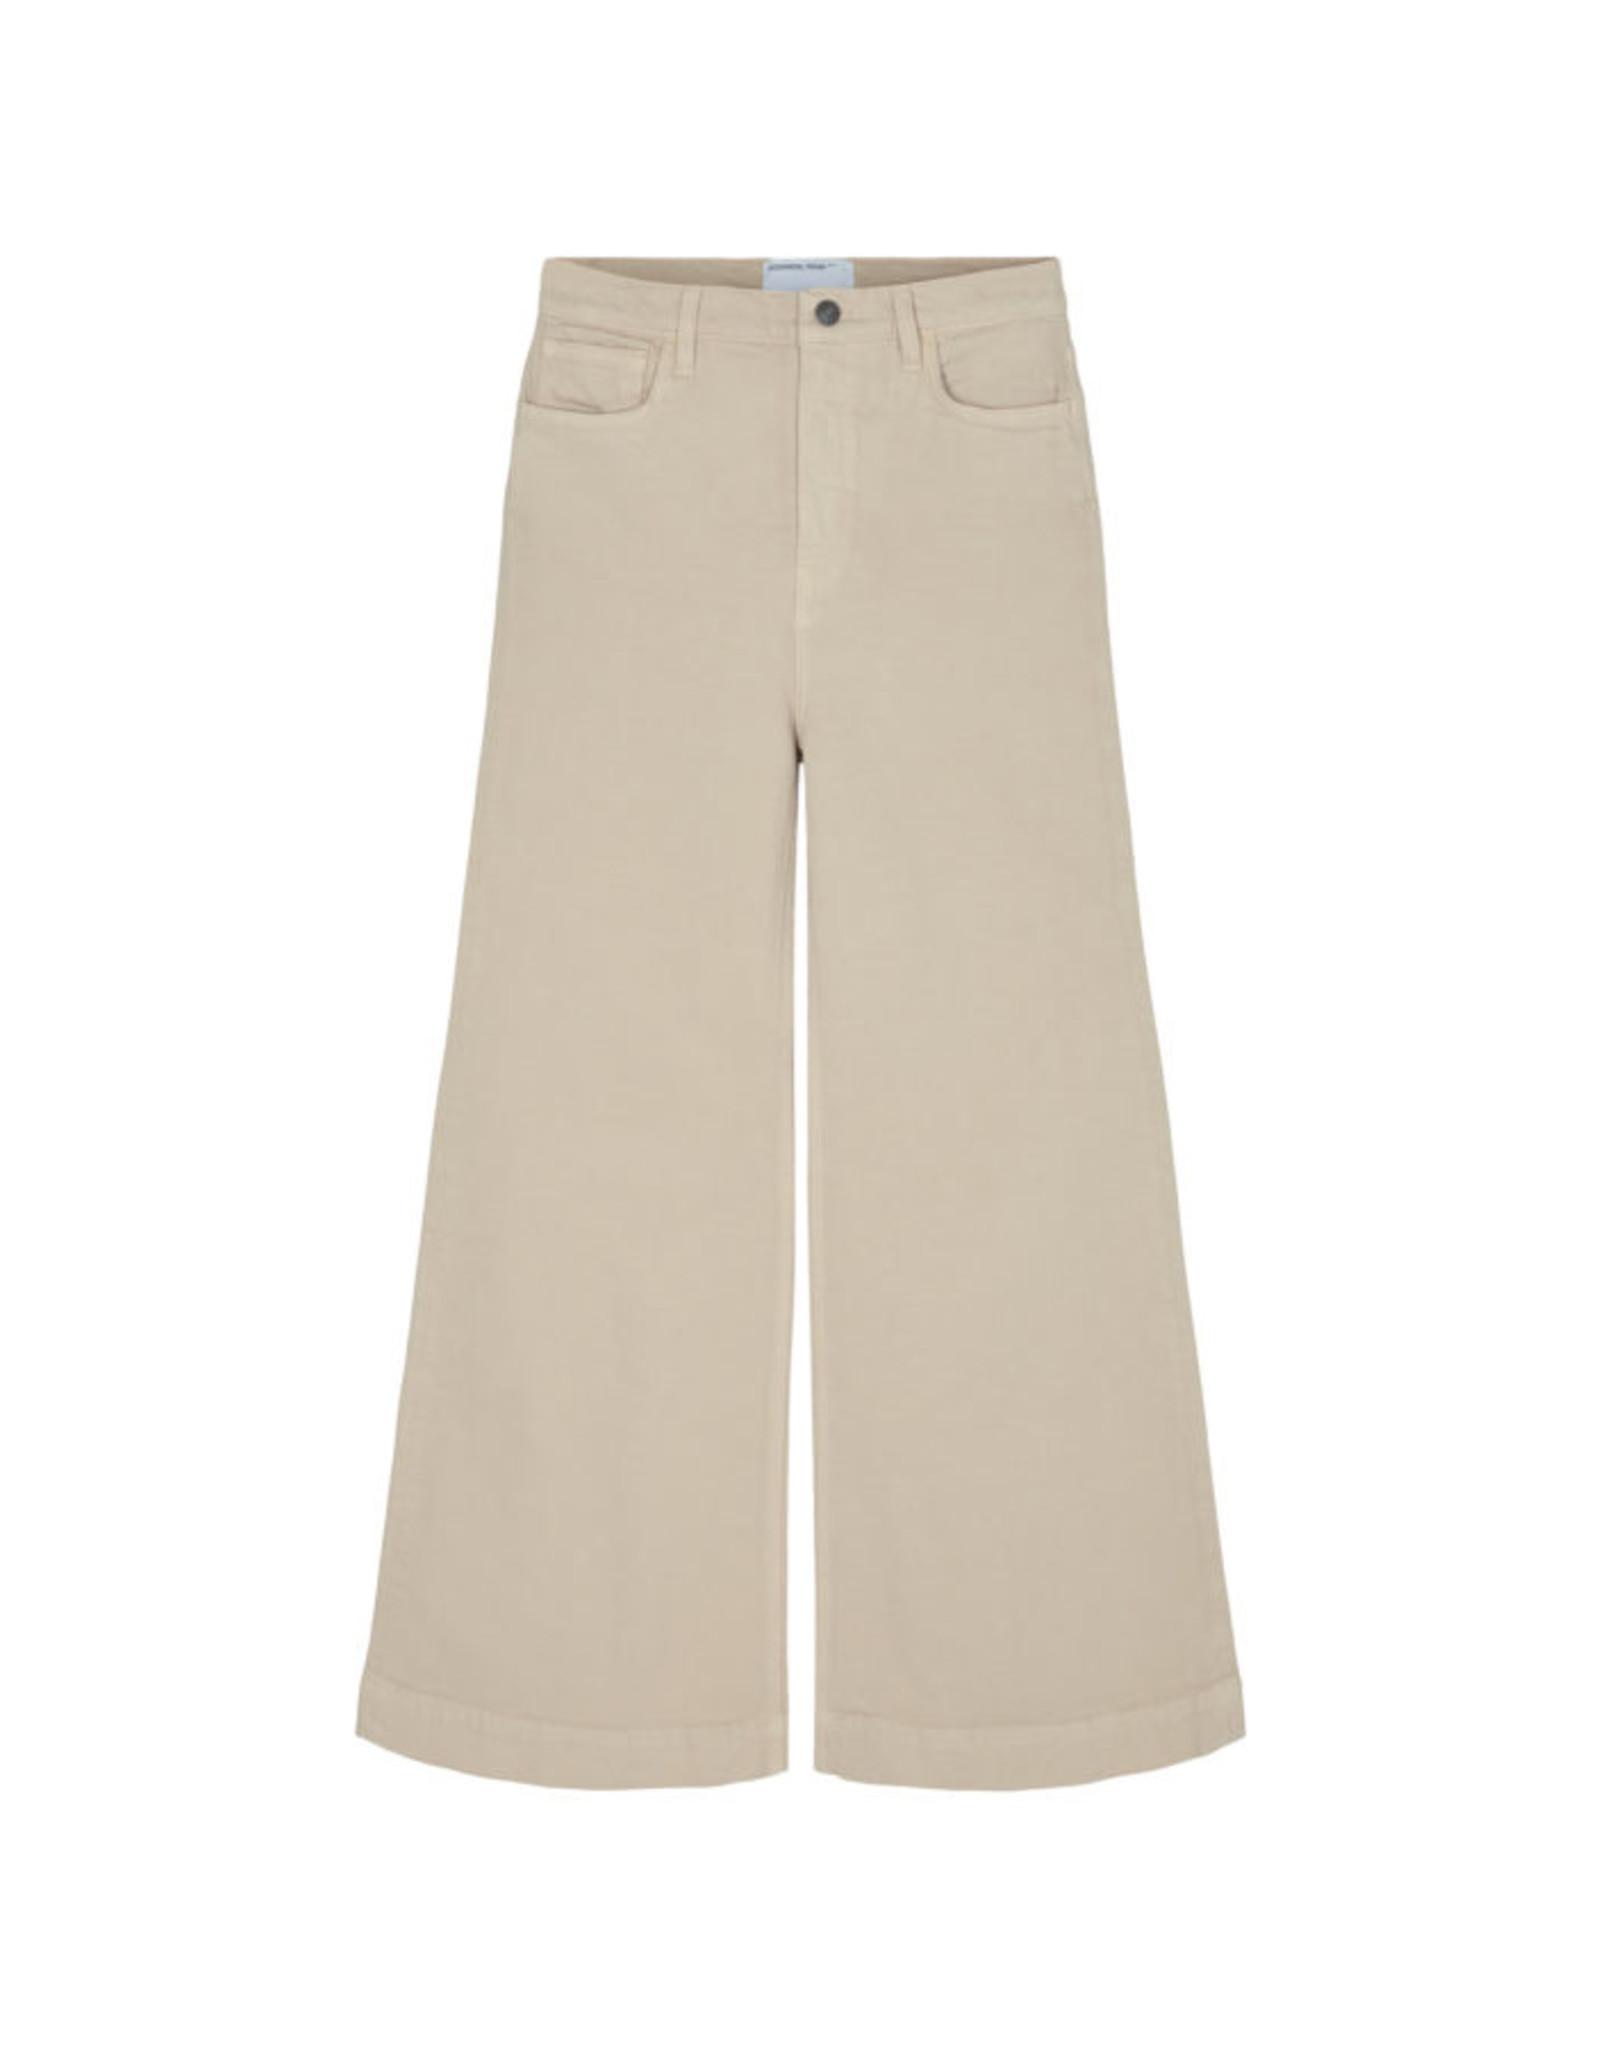 DRG SS21 16554 Bellis wide jeans